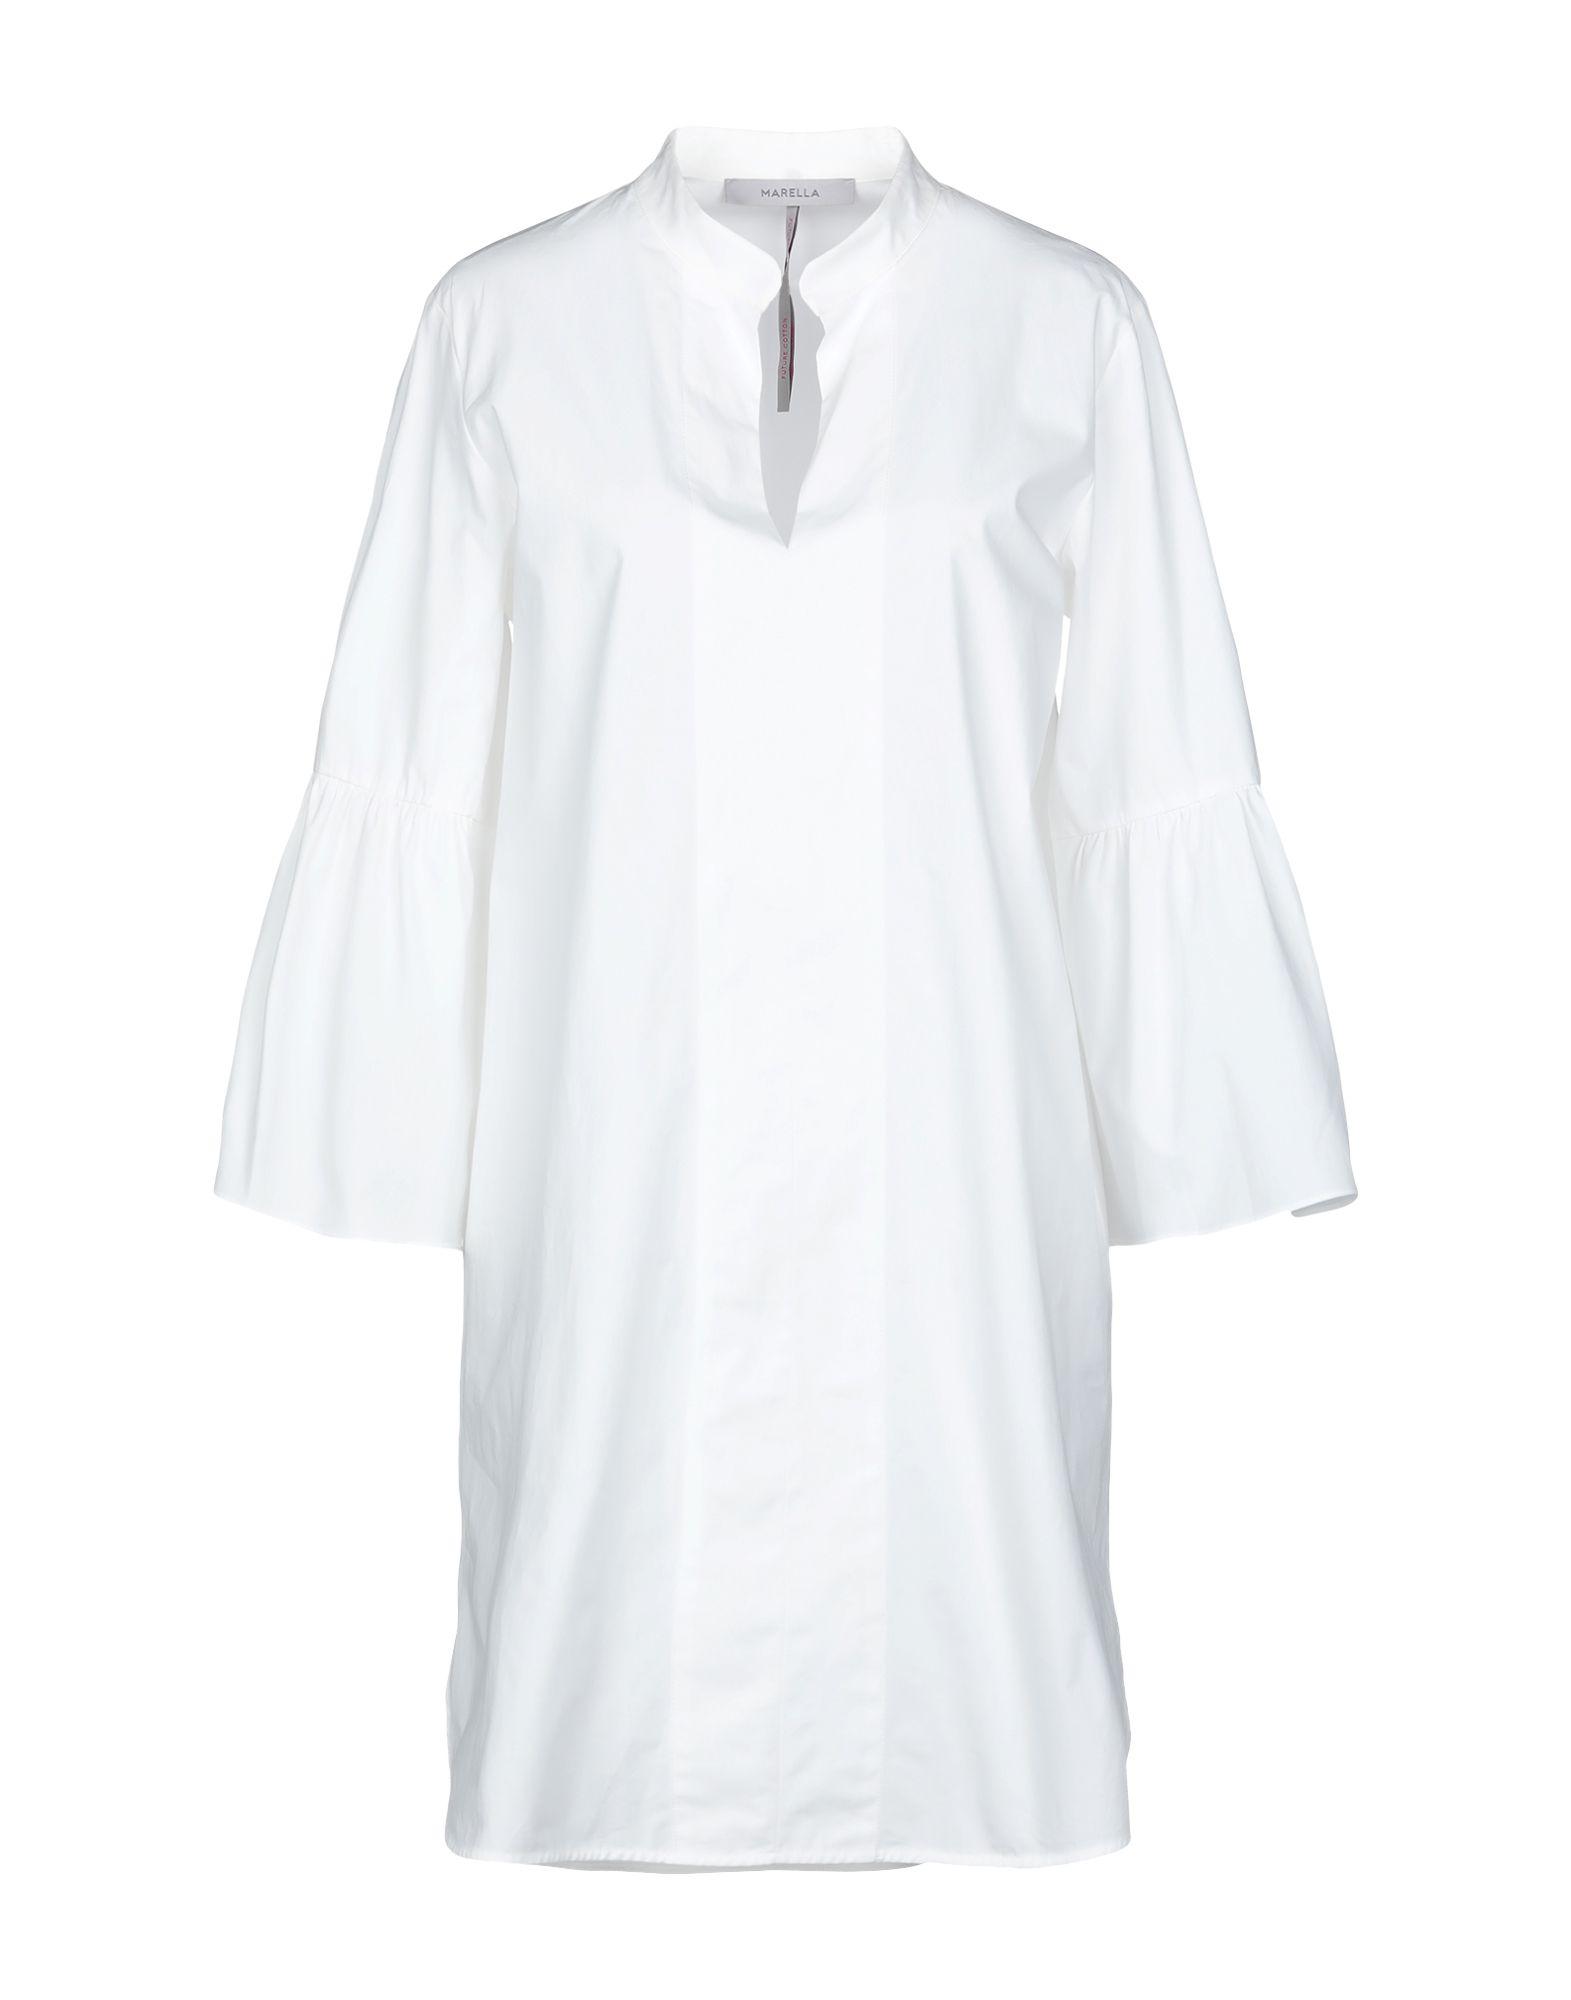 MARELLA Короткое платье платье рубашка fox yulia sway платье рубашка fox